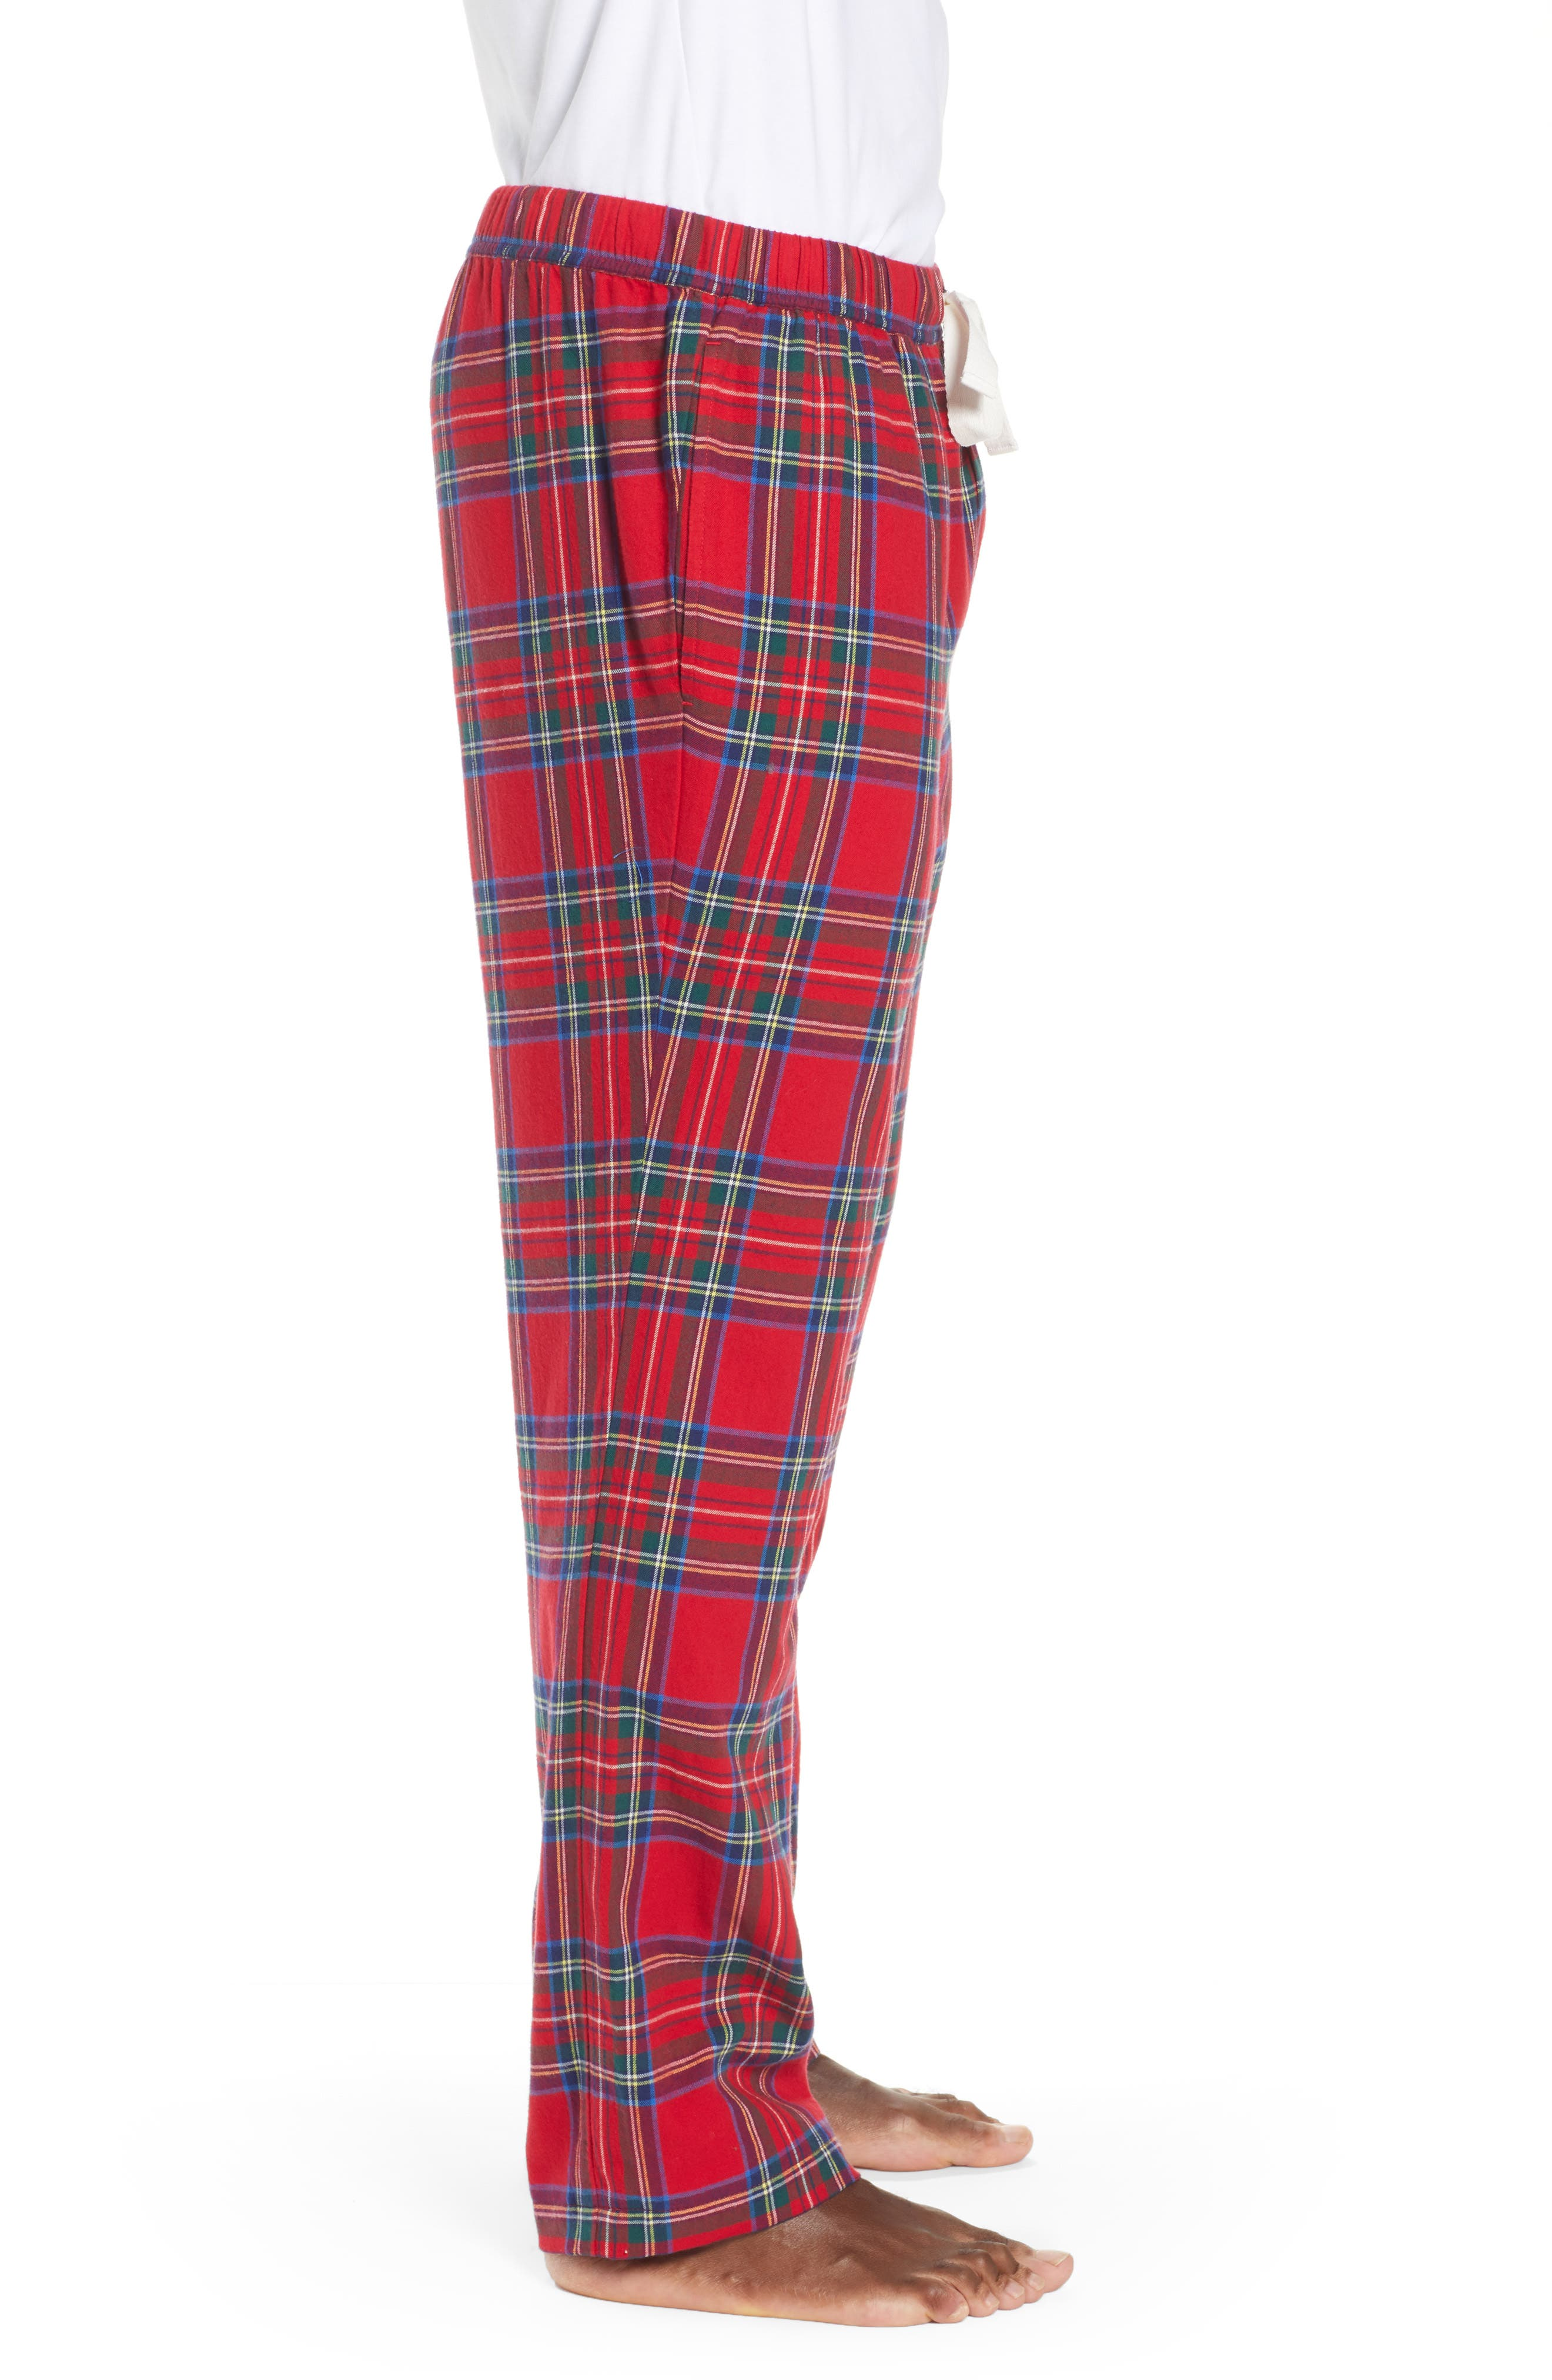 Jolly Plaid Cotton Flannel Pajama Pants,                             Alternate thumbnail 3, color,                             786